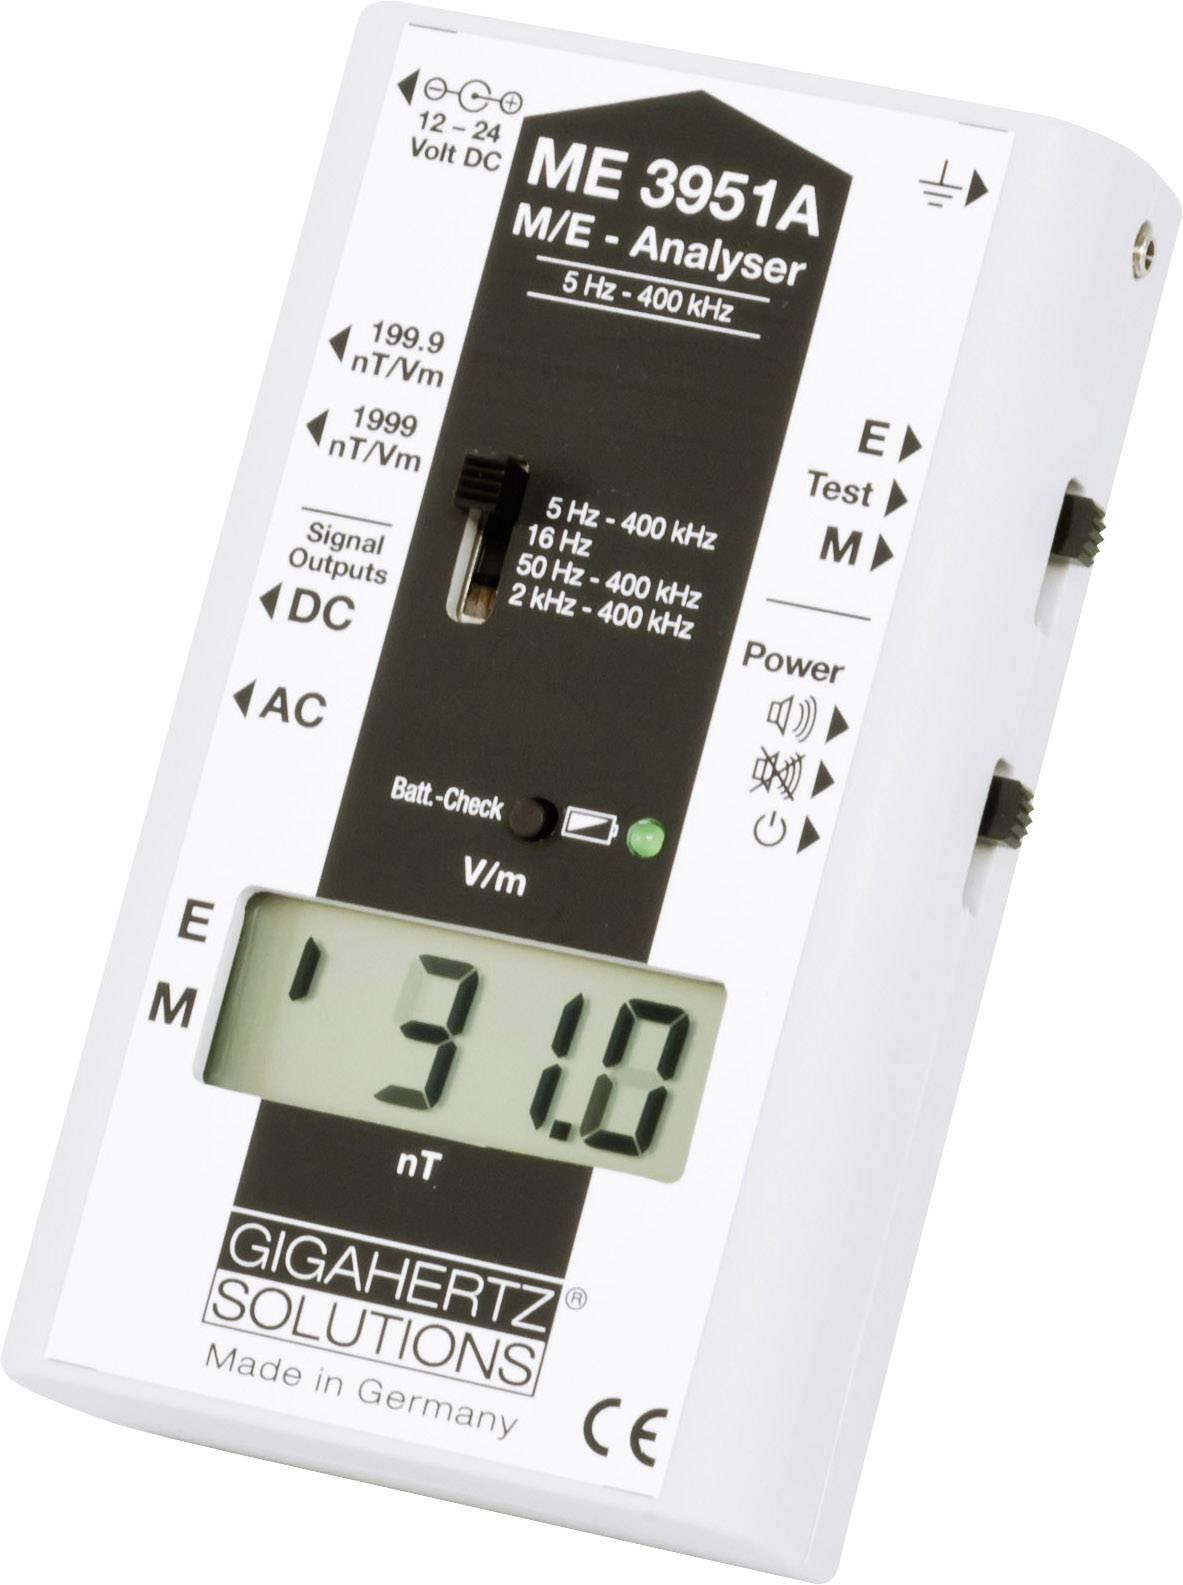 NF analyzátor elektrosmogu Gigahertz ME3951A, 5 Hz - 400 kHz